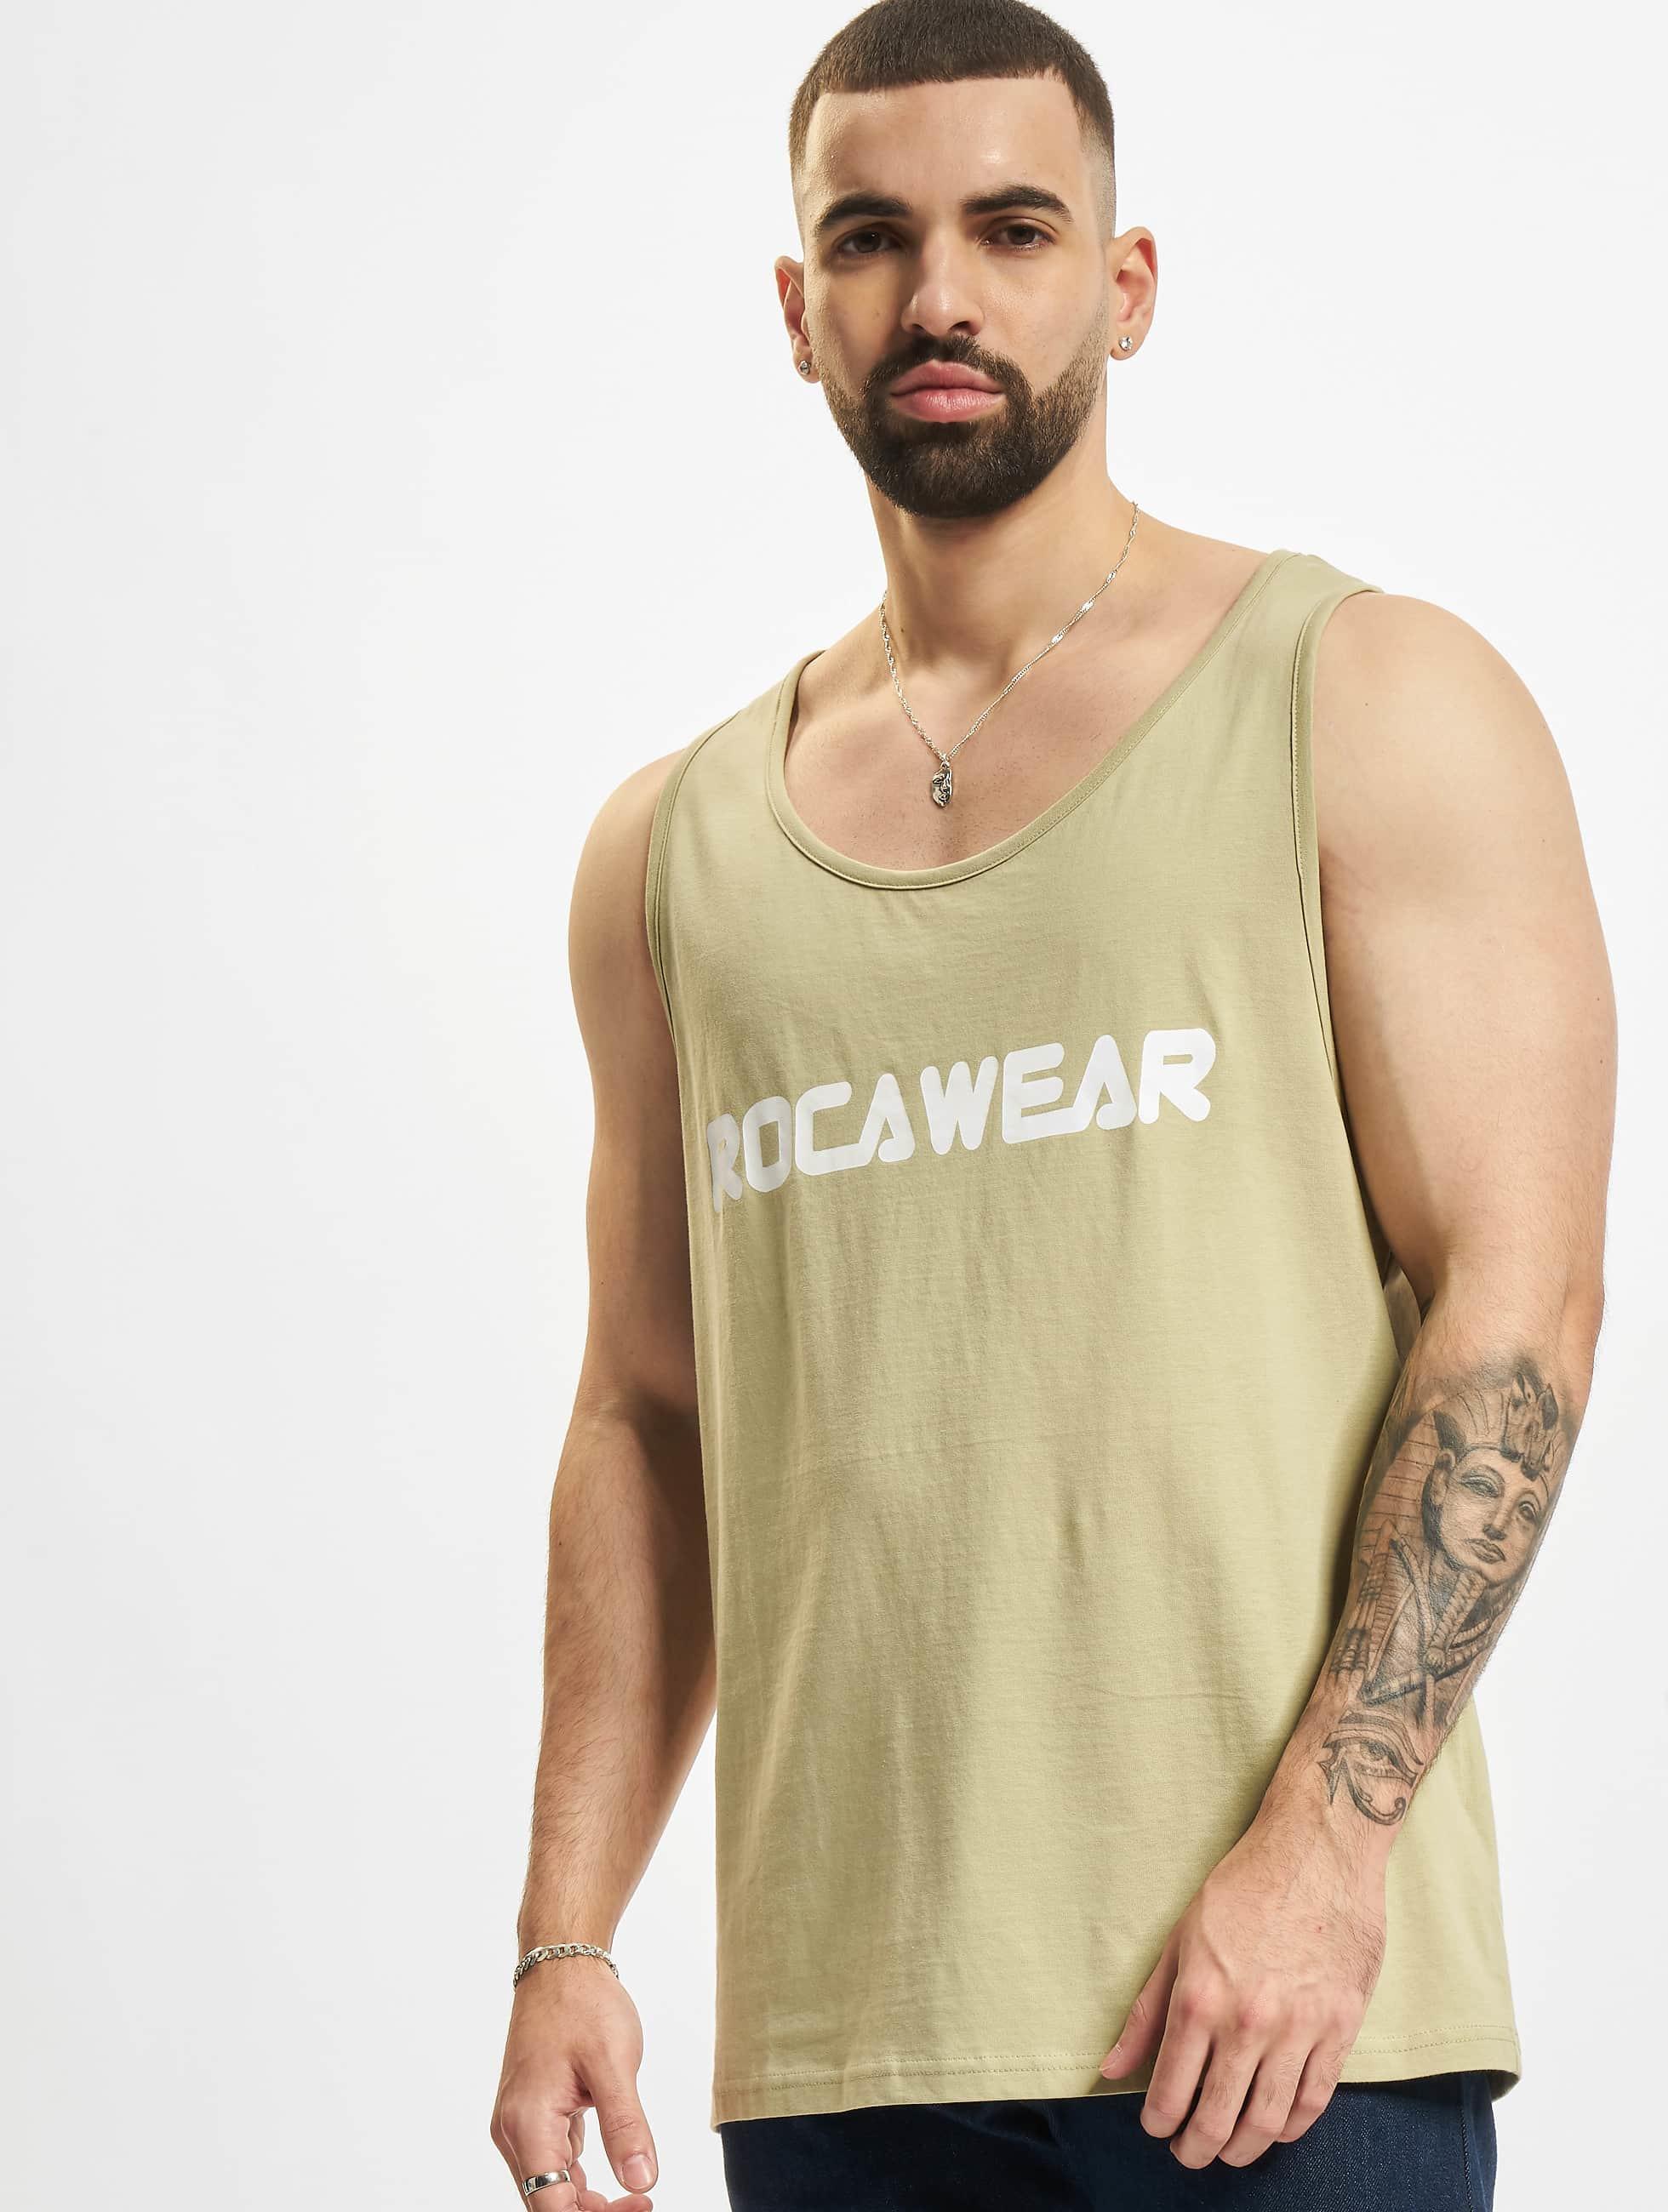 Rocawear / Tank Tops Color Block in khaki XL